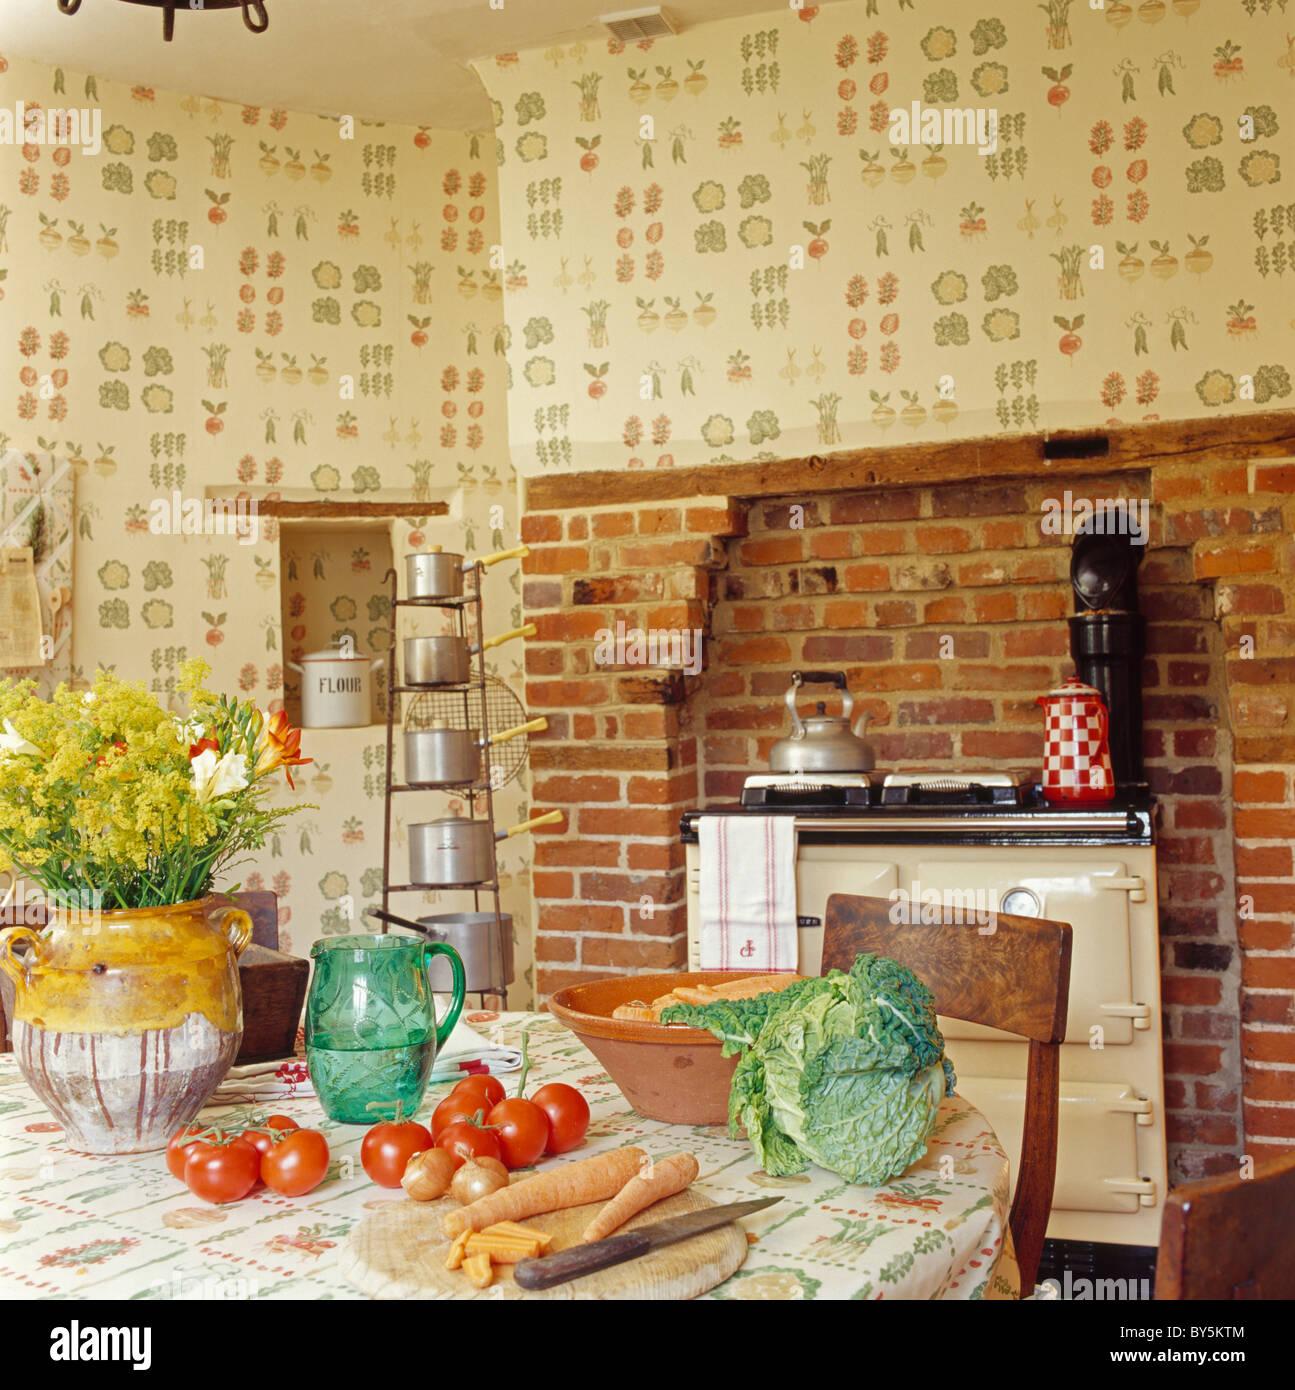 Traditional settings wallpaper stockfotos traditional for Tapeten land